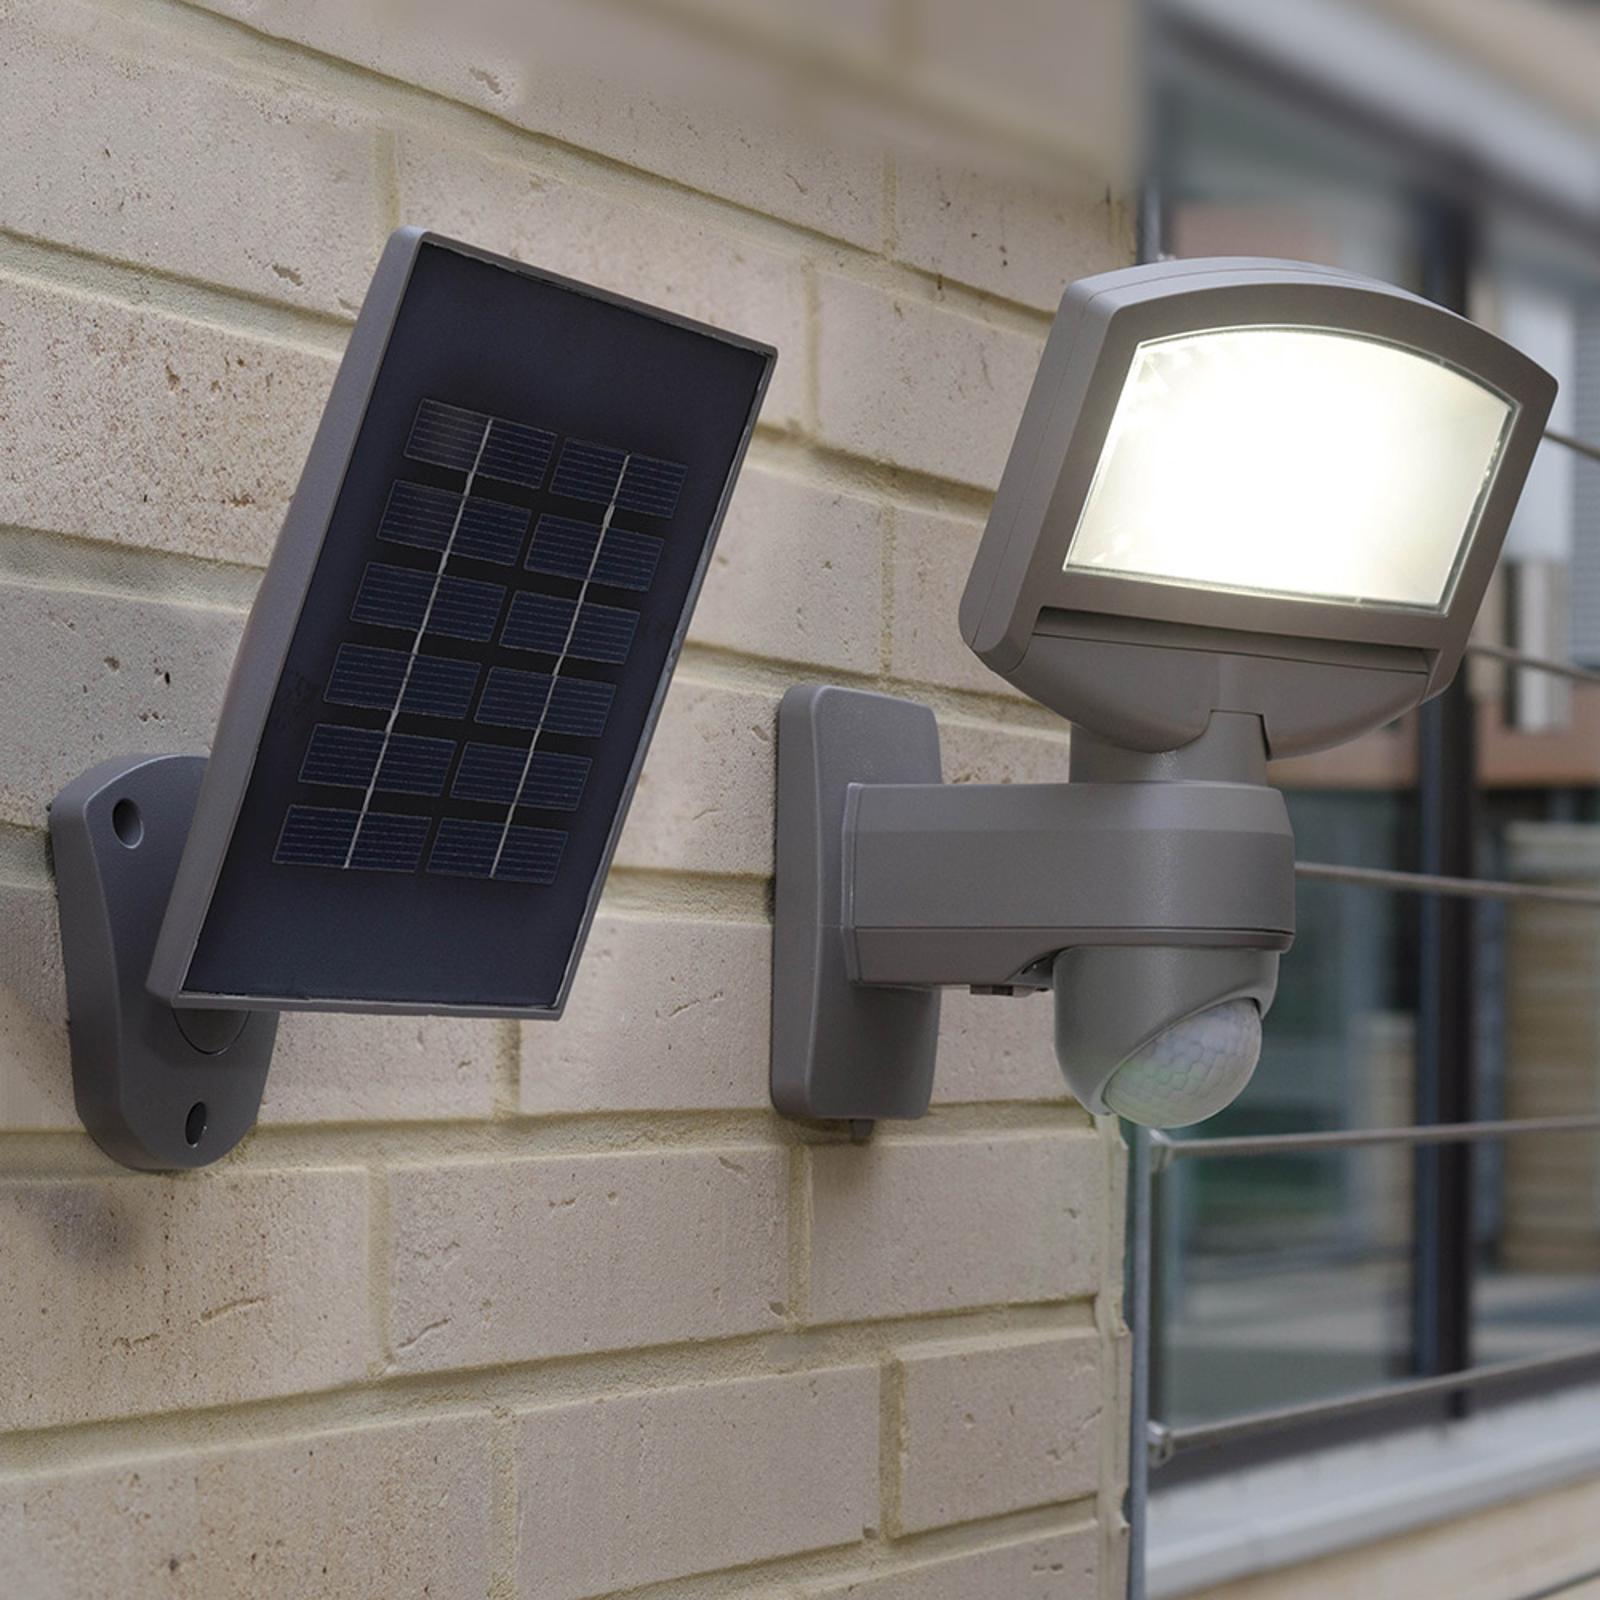 Solárne vonkajšie LED Lord Sunshine s modulom_3006215_1